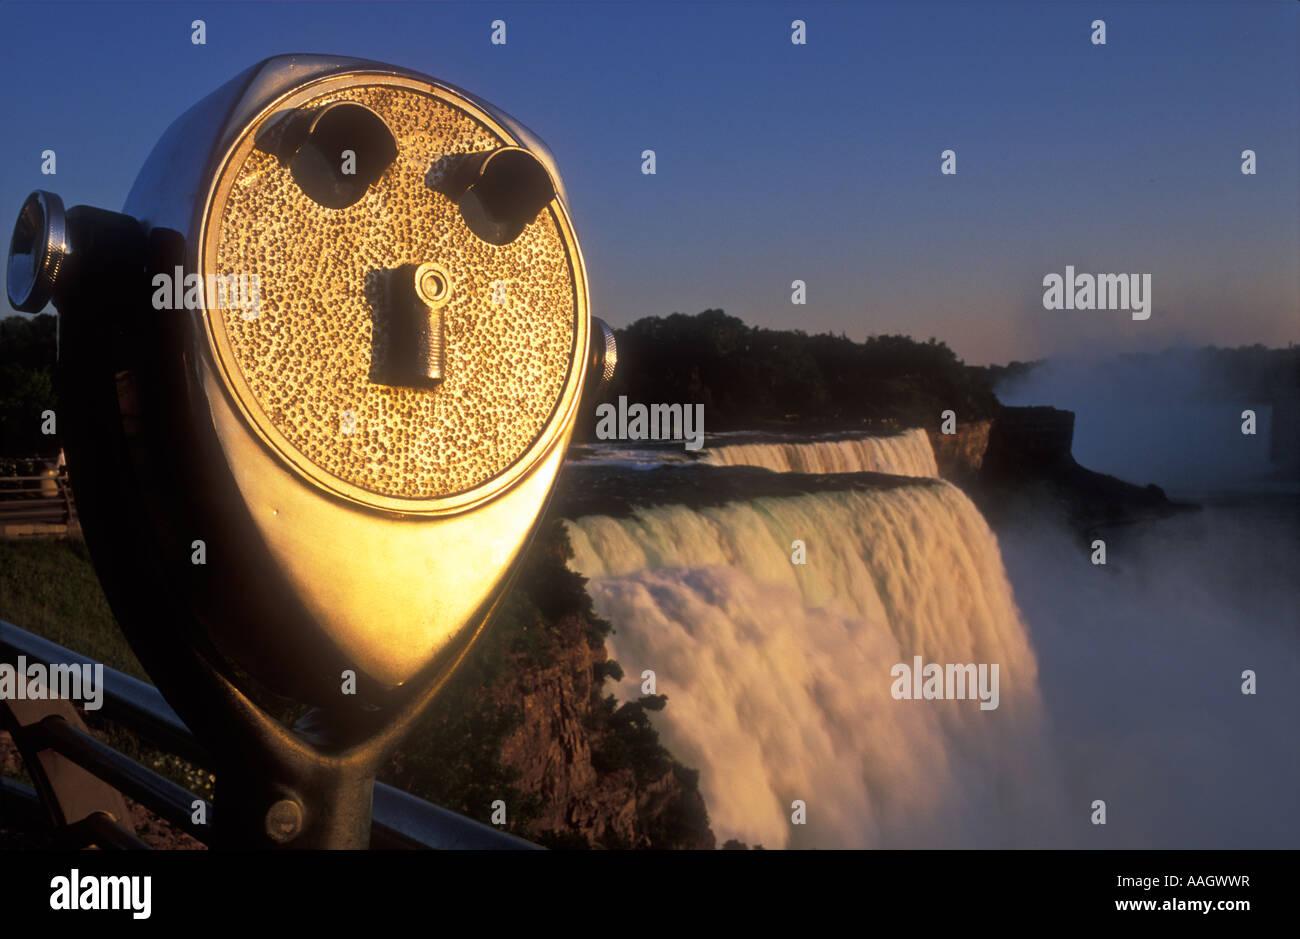 USA New York Niagara Falls American Falls viewing telescope illuminated by warm sunlight - Stock Image